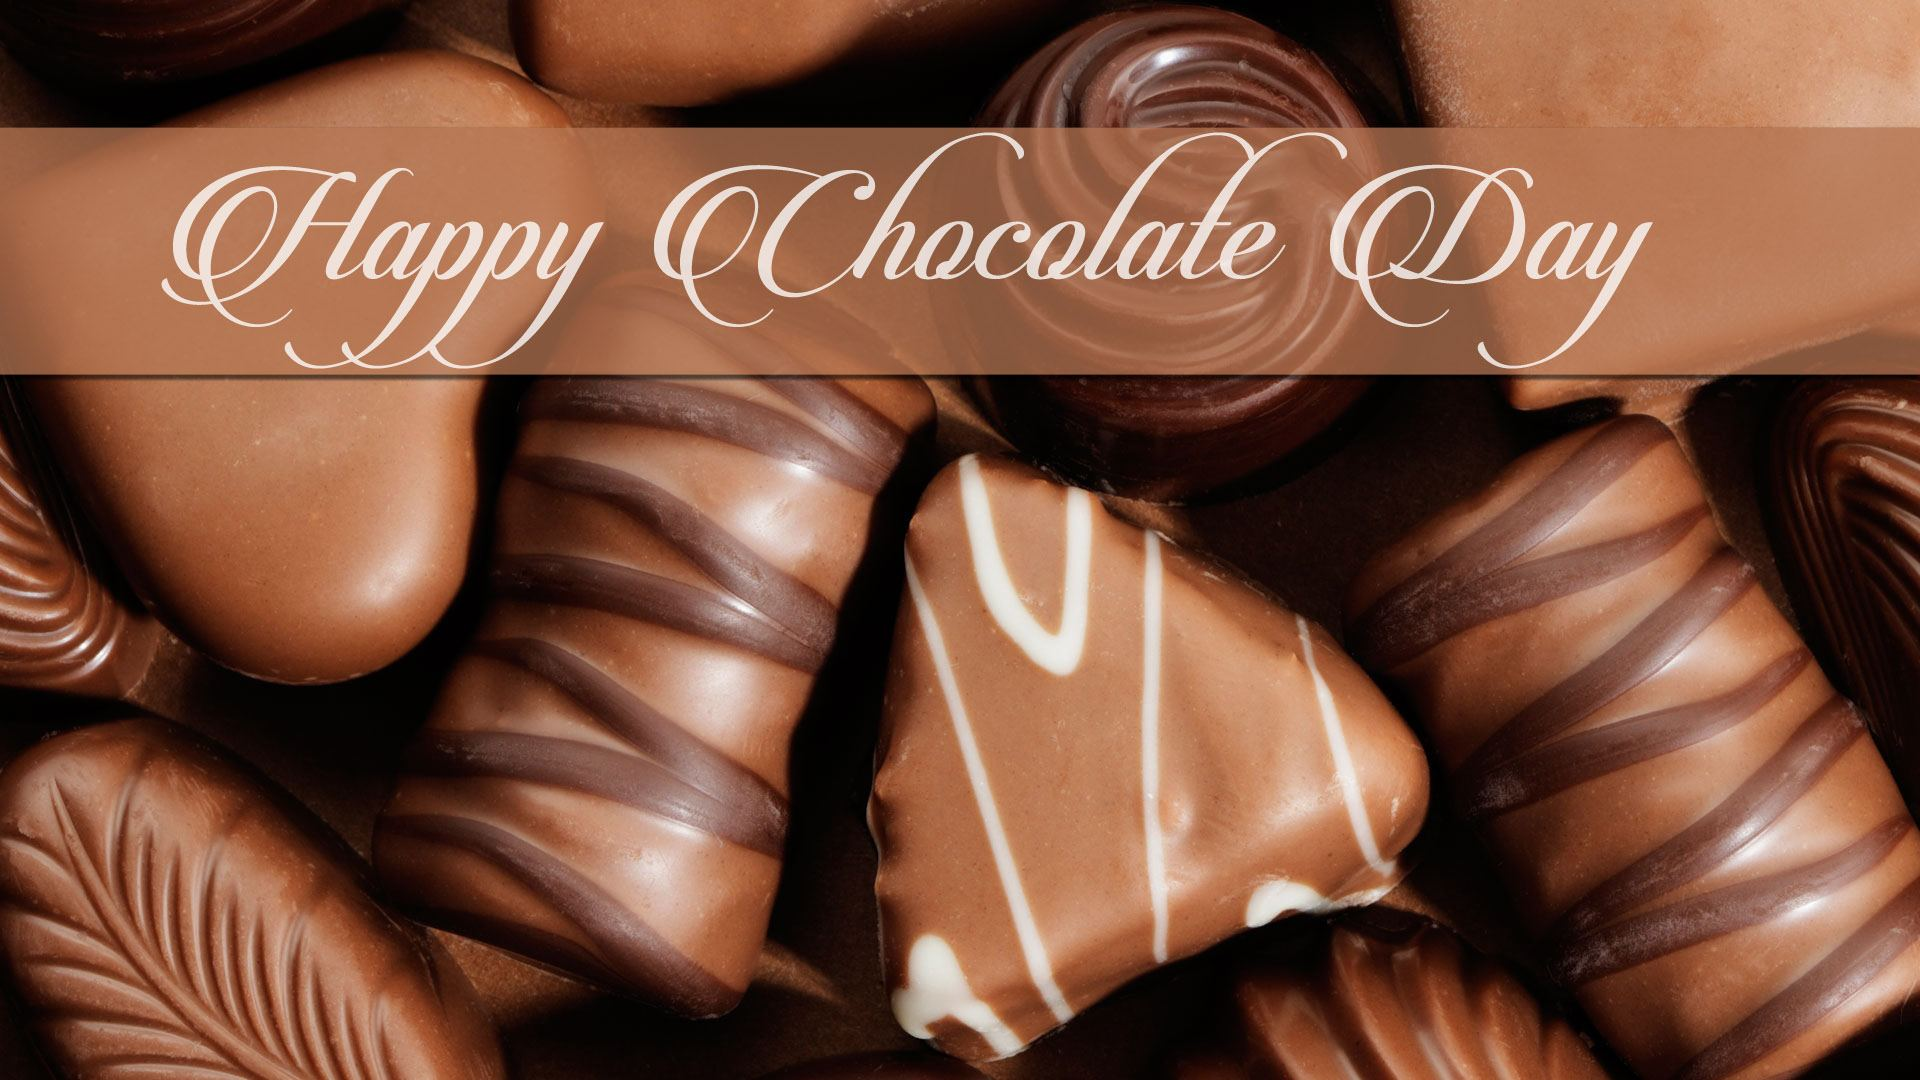 Happy Chocolate Day 2017